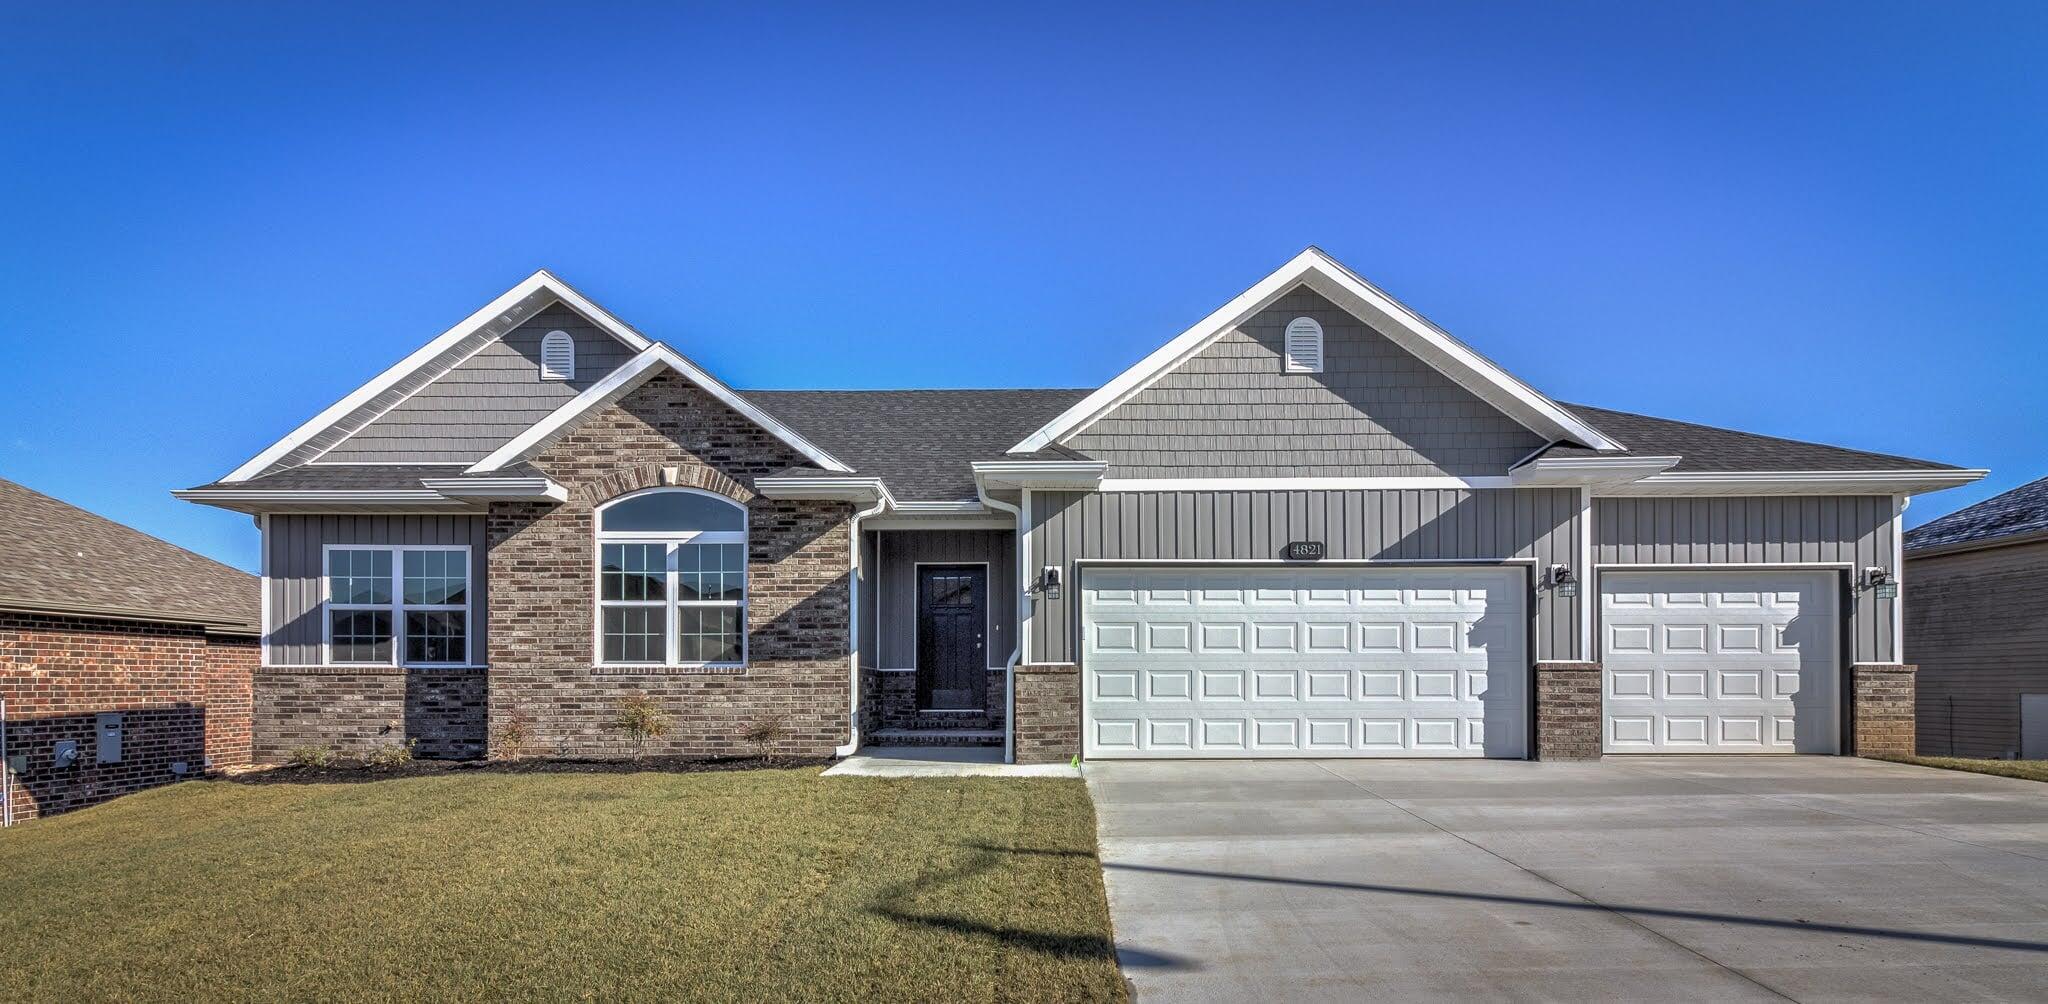 Lot 14 Lakewood Estates 2nd Addition Rogersville, MO 65742